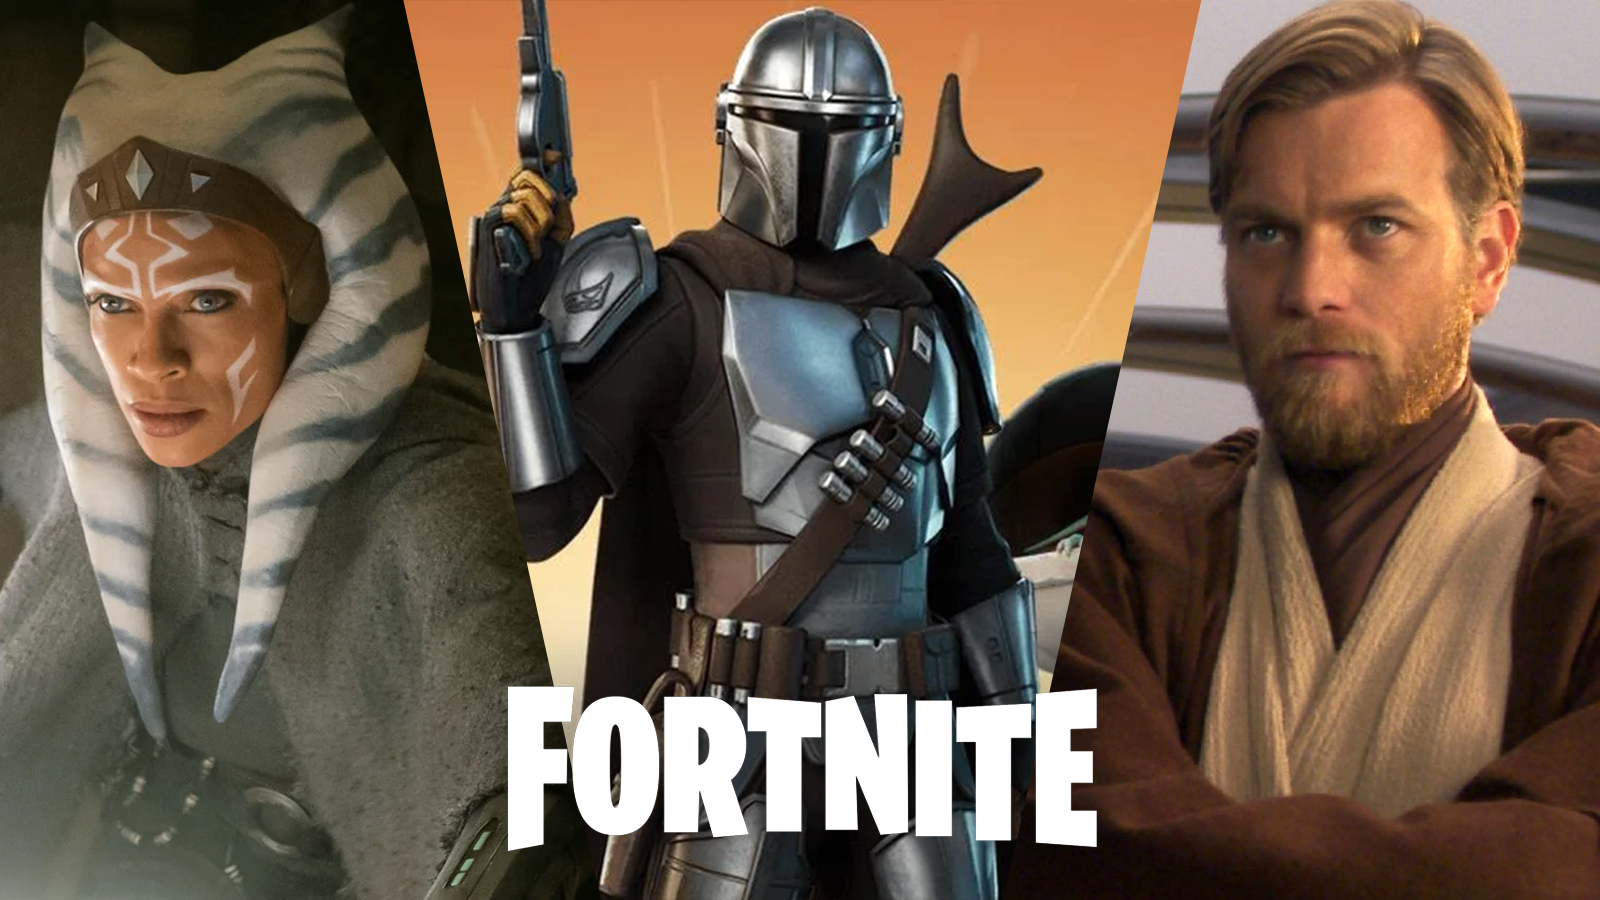 Fortnite Star Wars skins